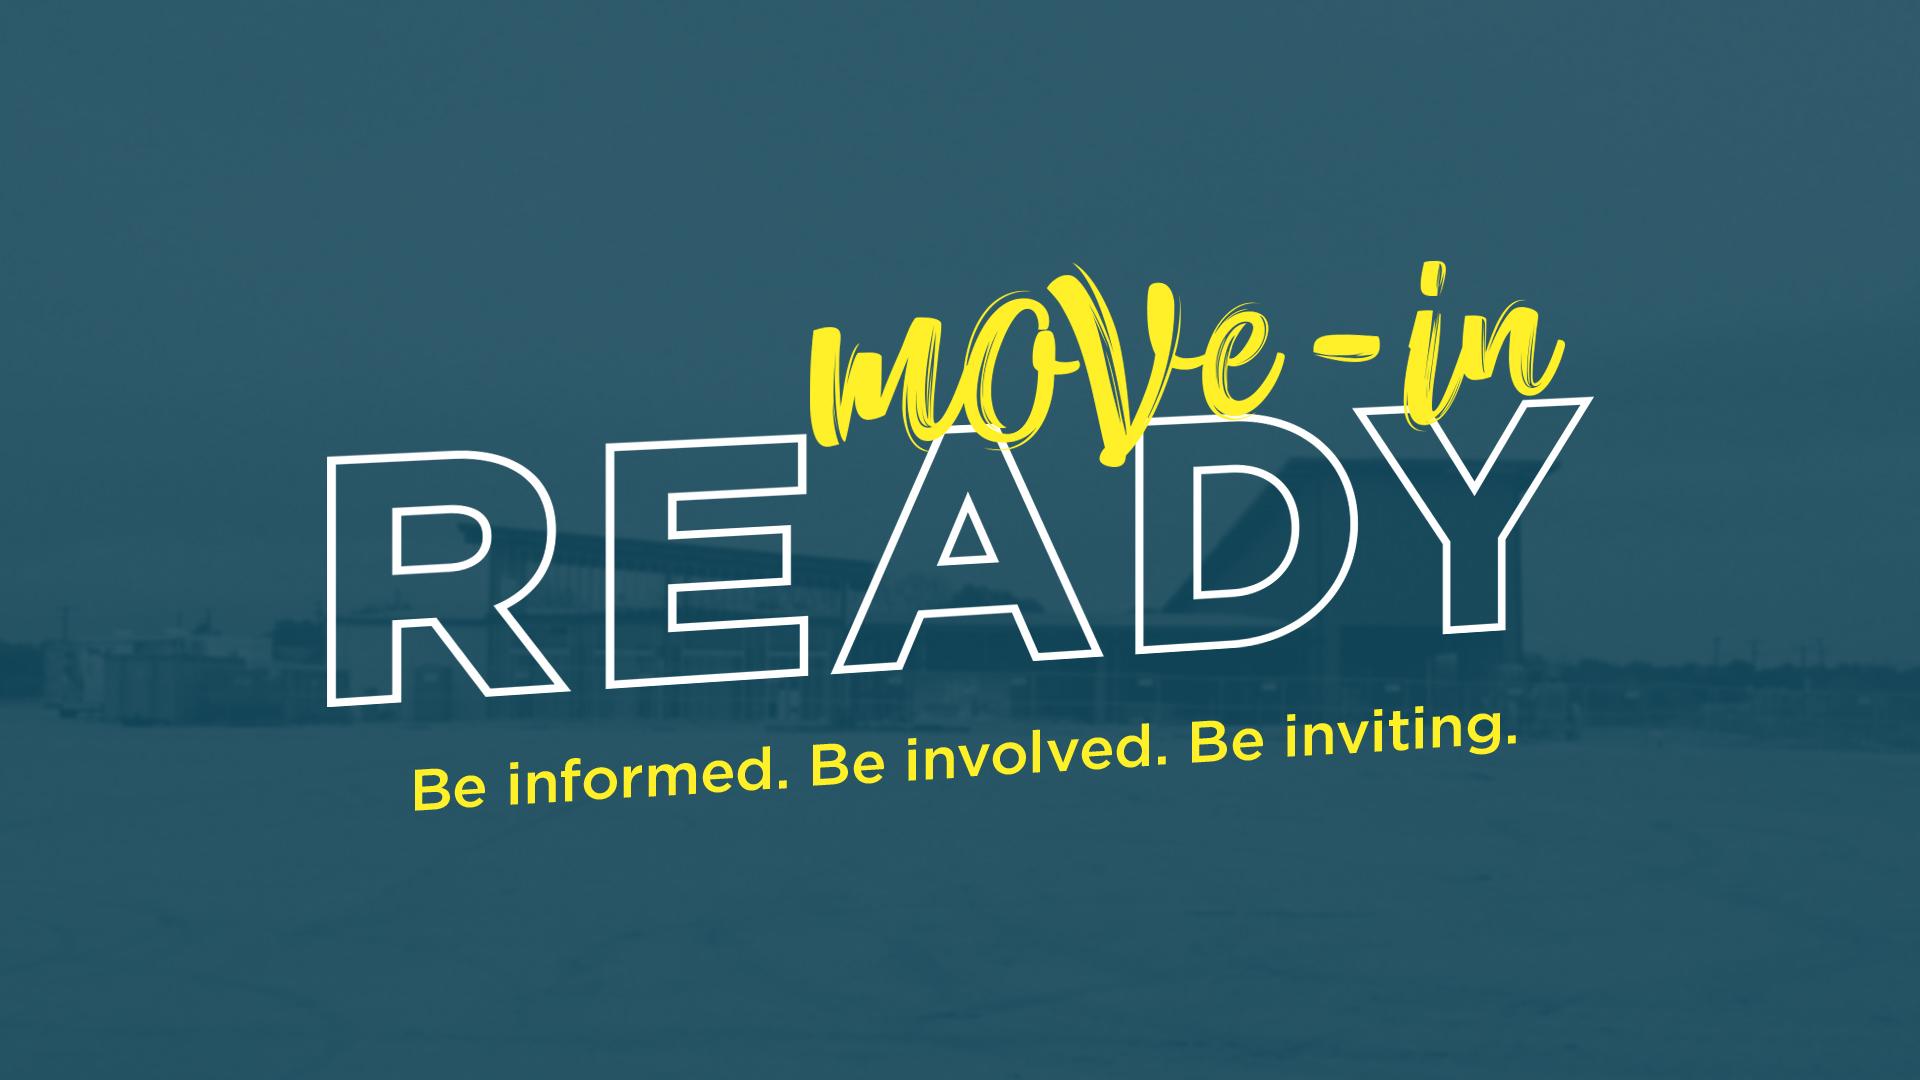 Move-In Ready - Title Slide.jpg